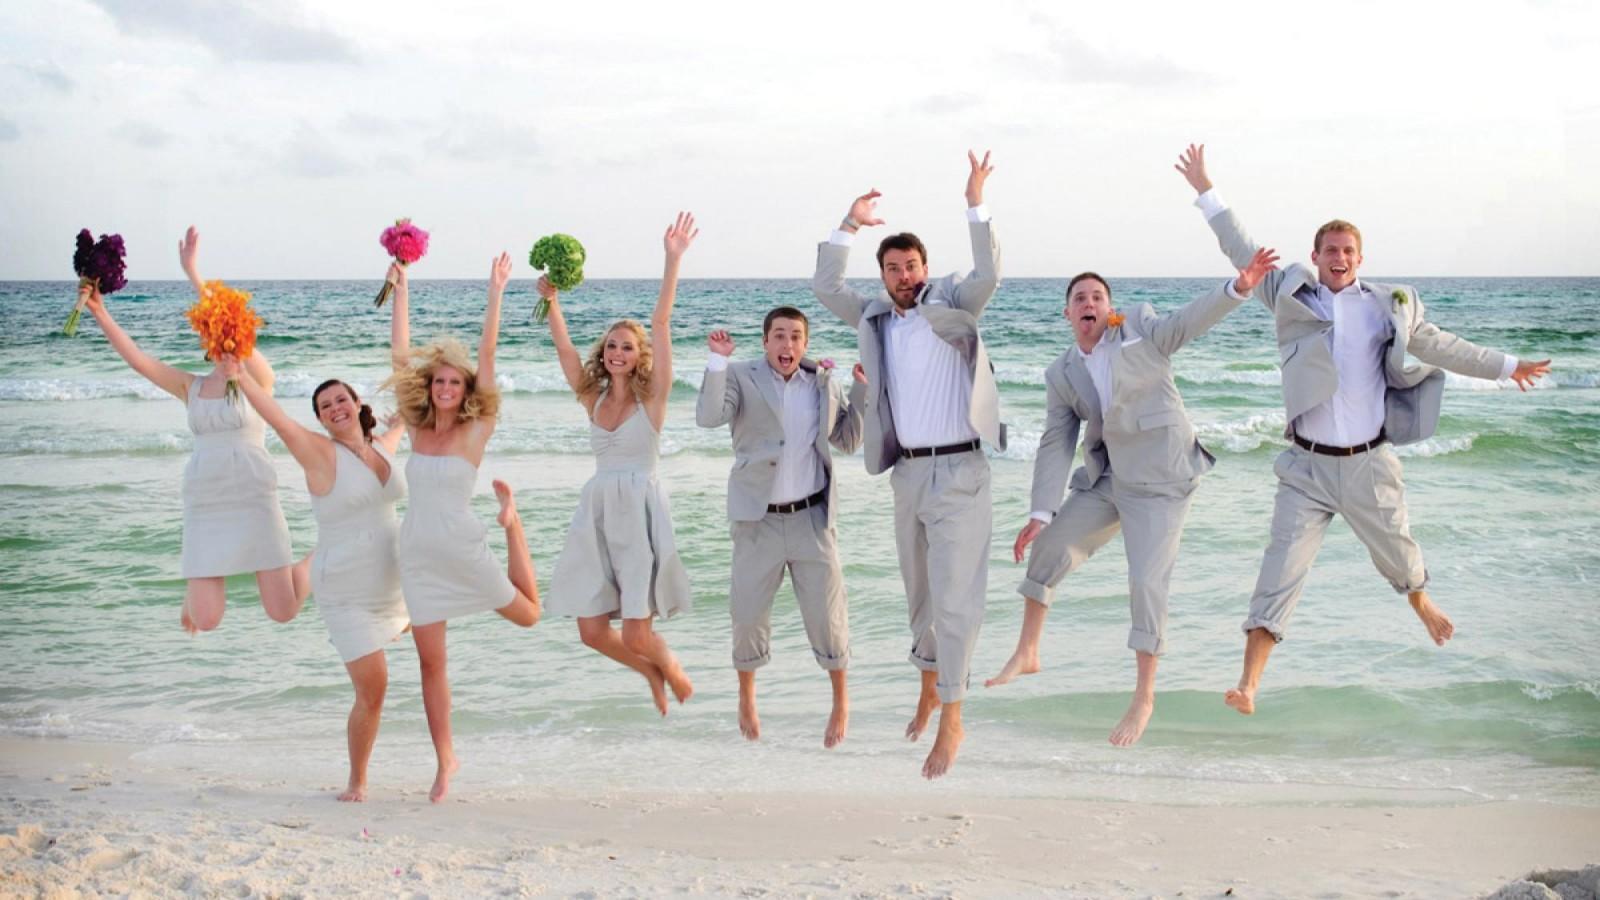 Matrimonio Spiaggia Look Uomo : Matrimonio a tema in spiaggia